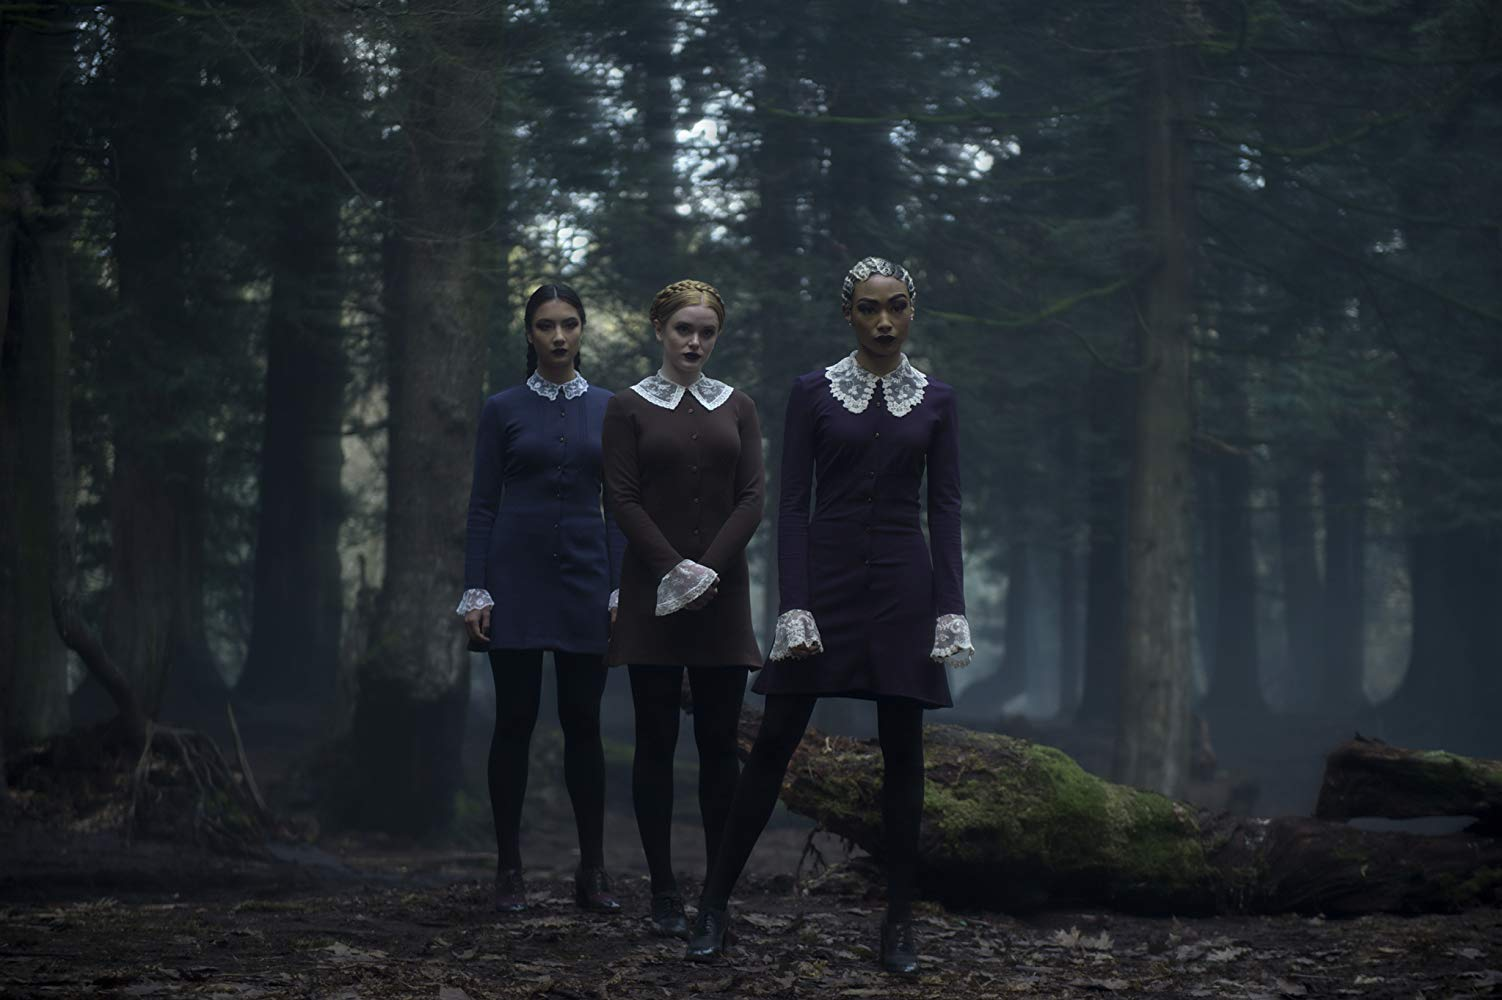 Le terrificanti avventure di Sabrina: Tati Gabrielle, Abigail F. Cowen, Adeline Rudolph